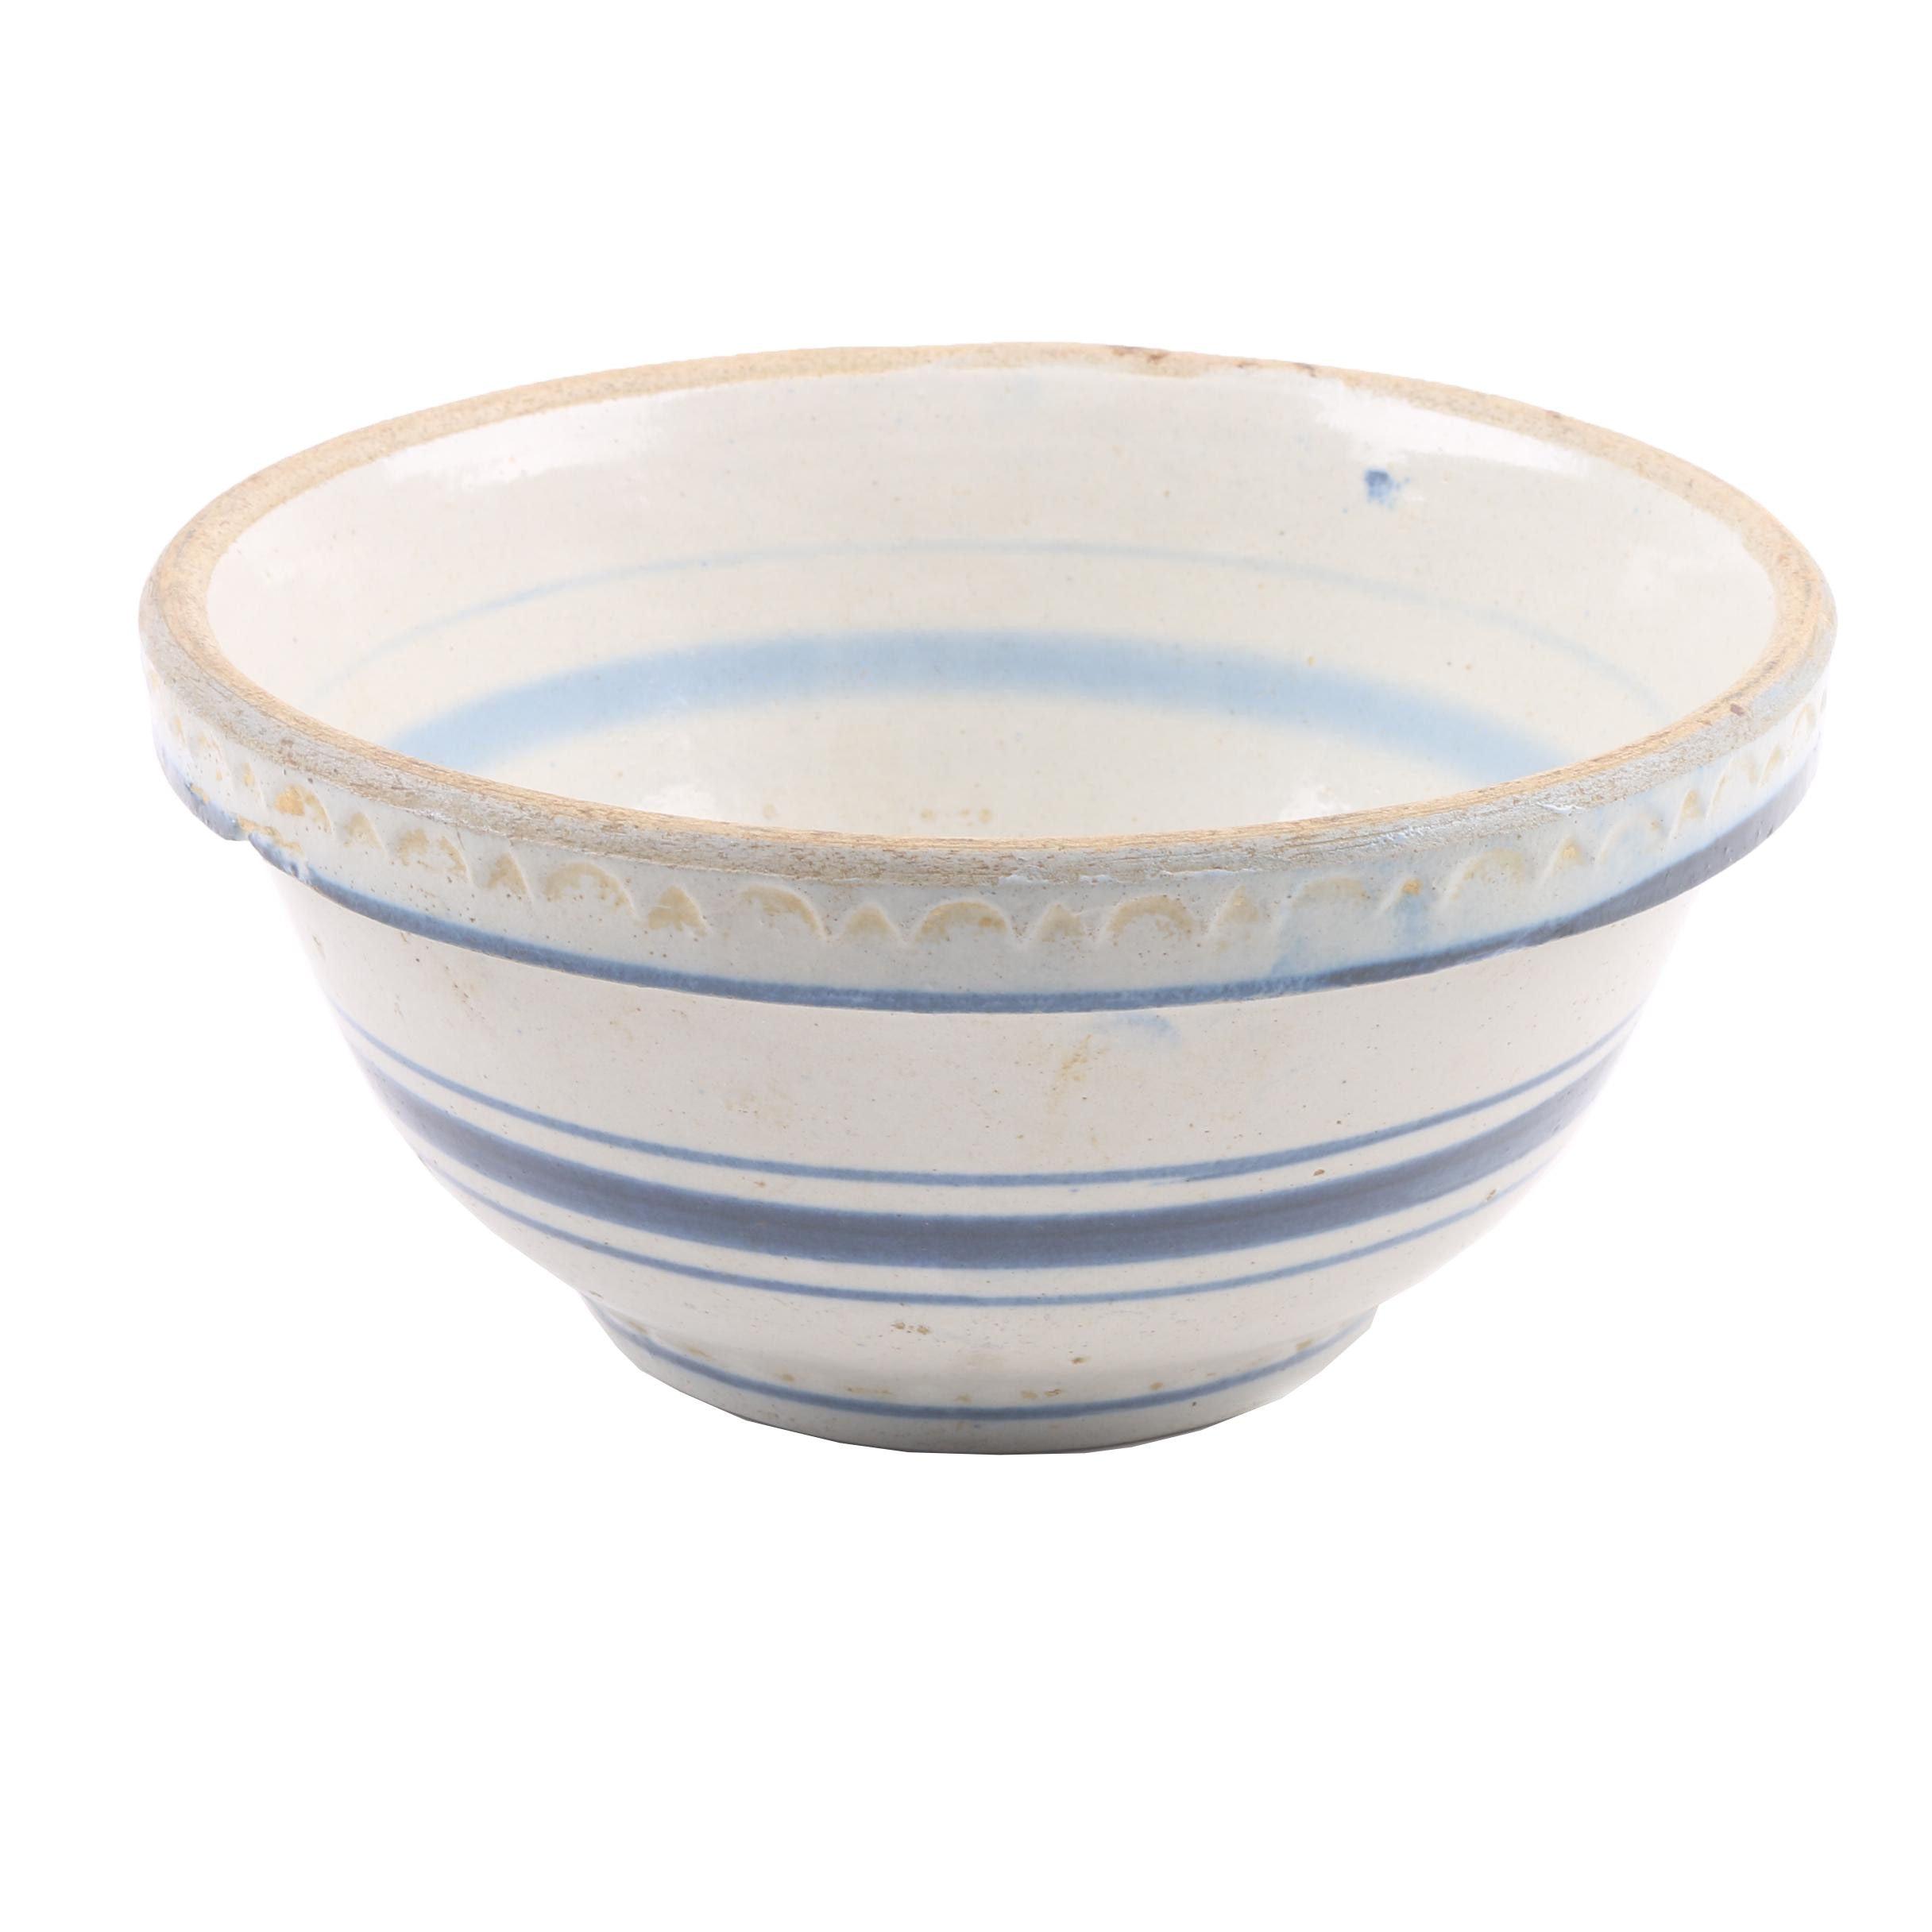 Vintage Blue and White Striped Salt Glazed Stoneware Mixing Bowl